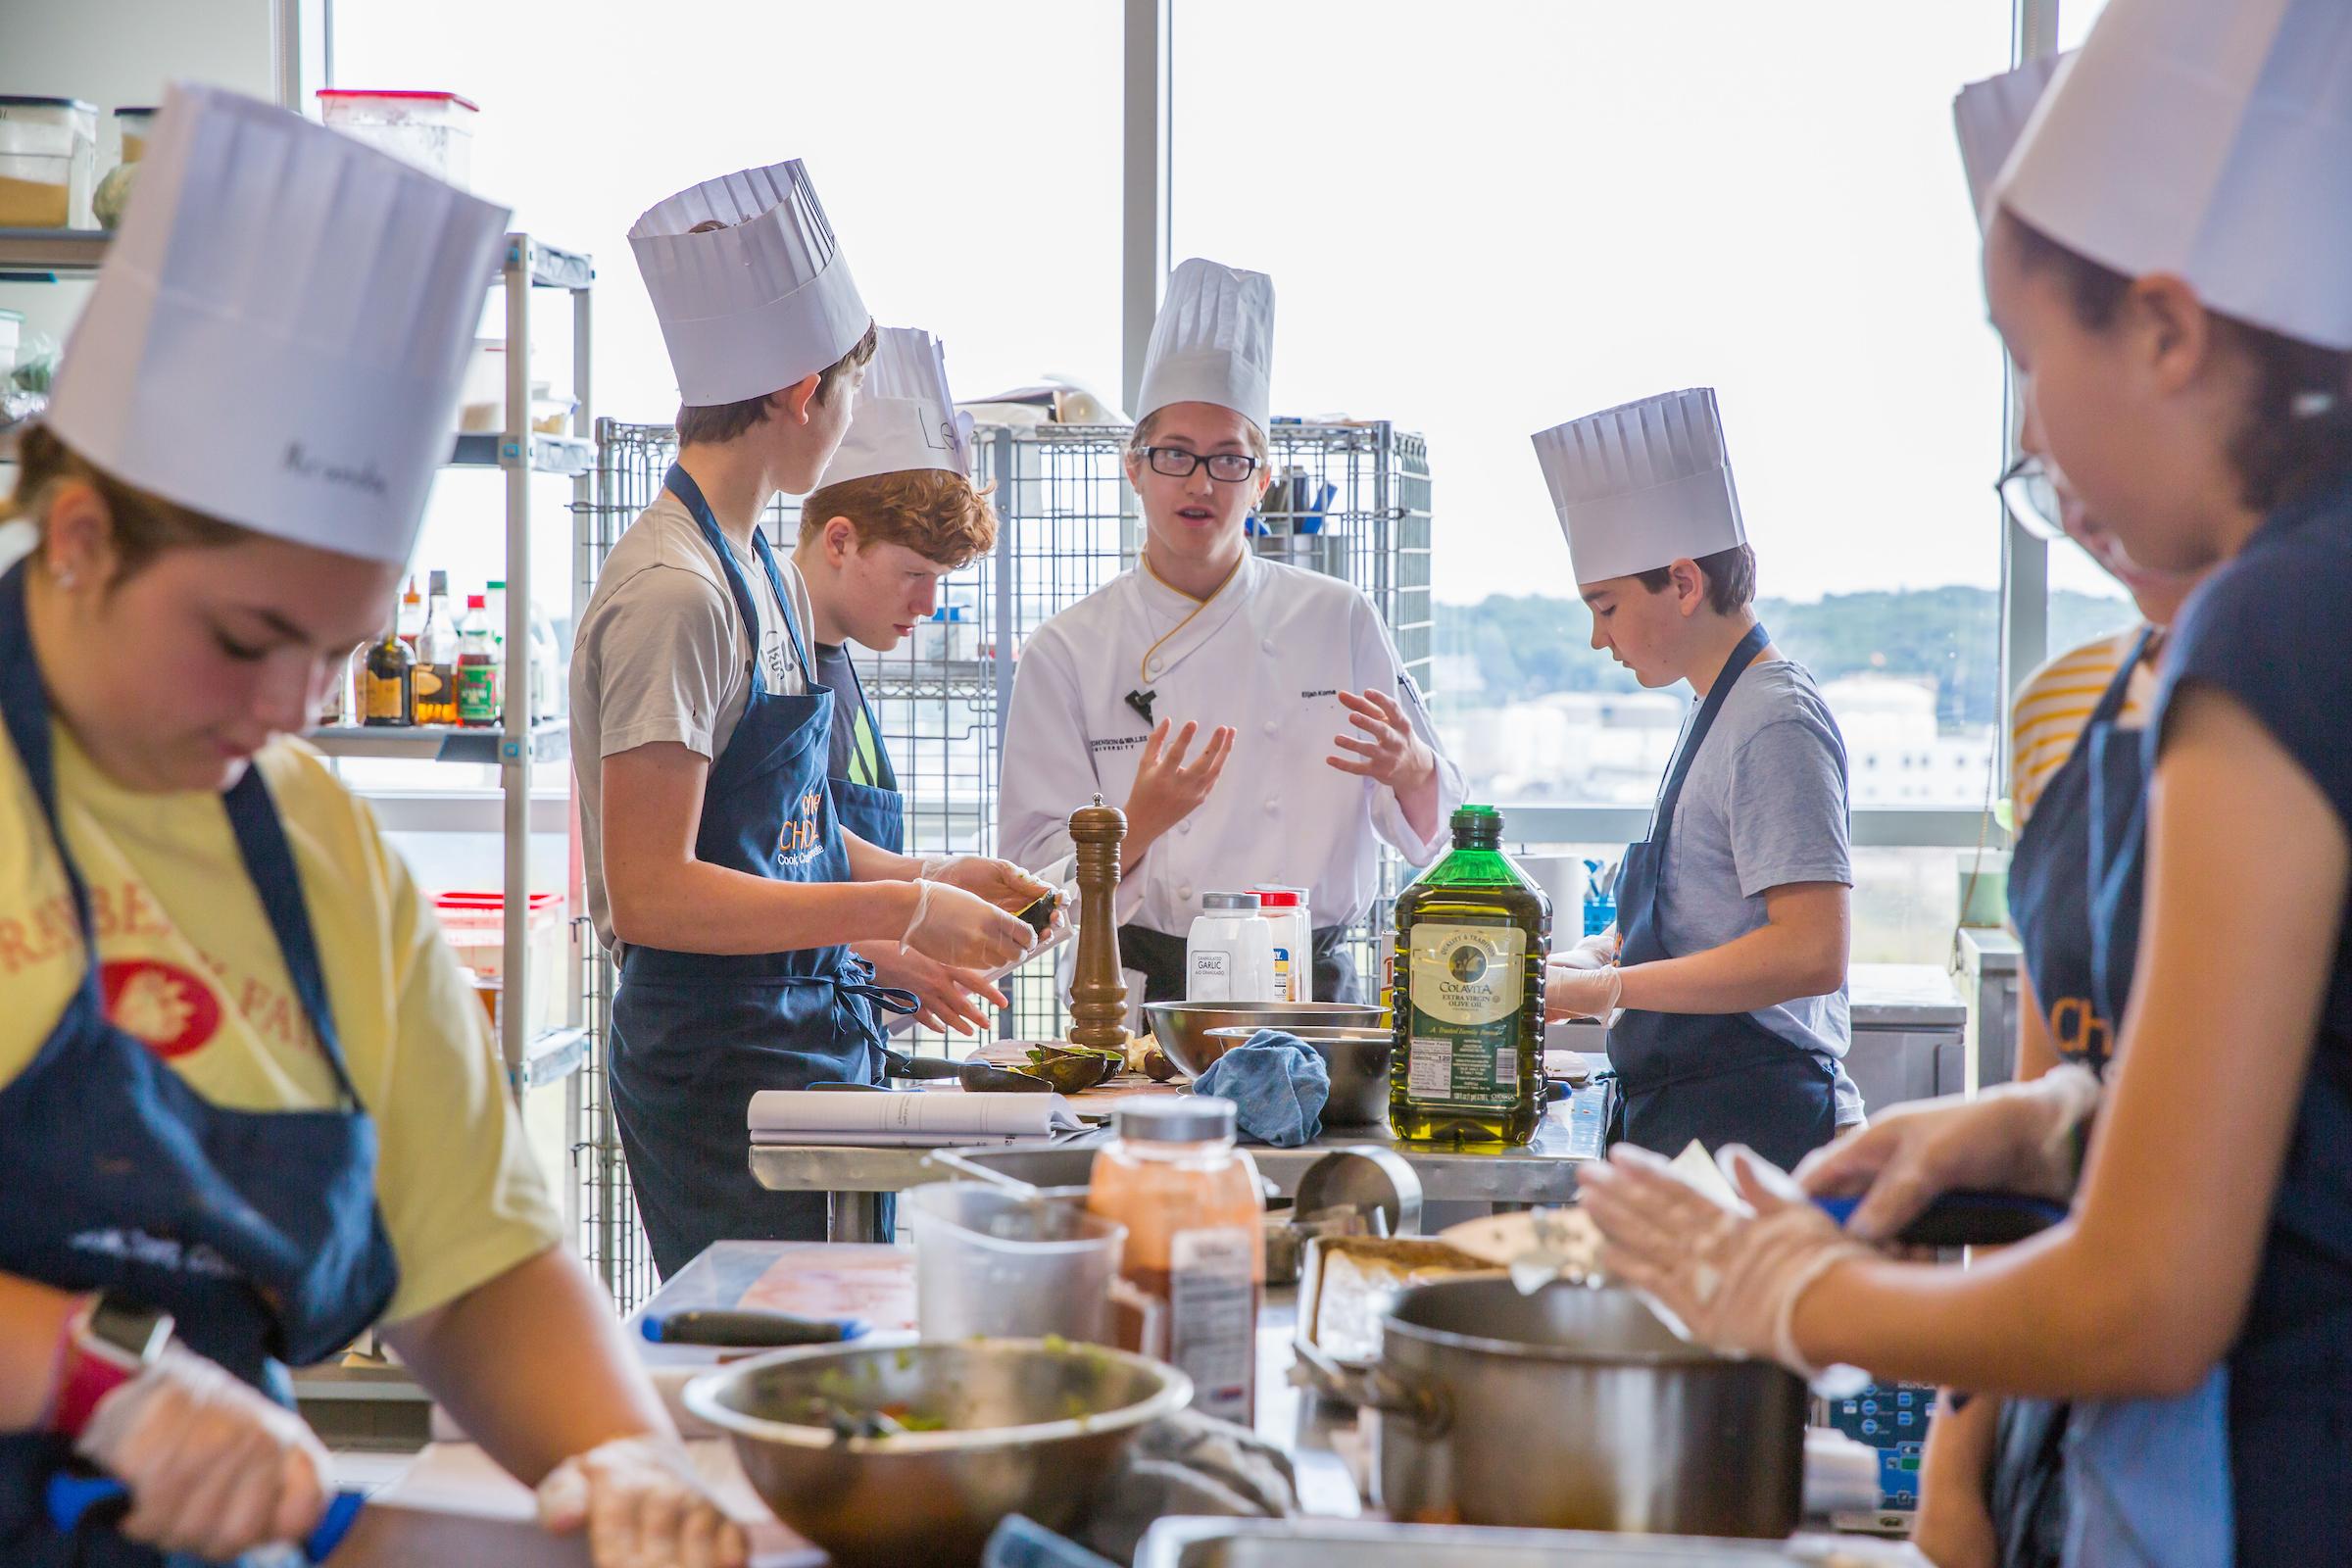 20190724_ChefsChoiceCamps_5I0A9443.jpg